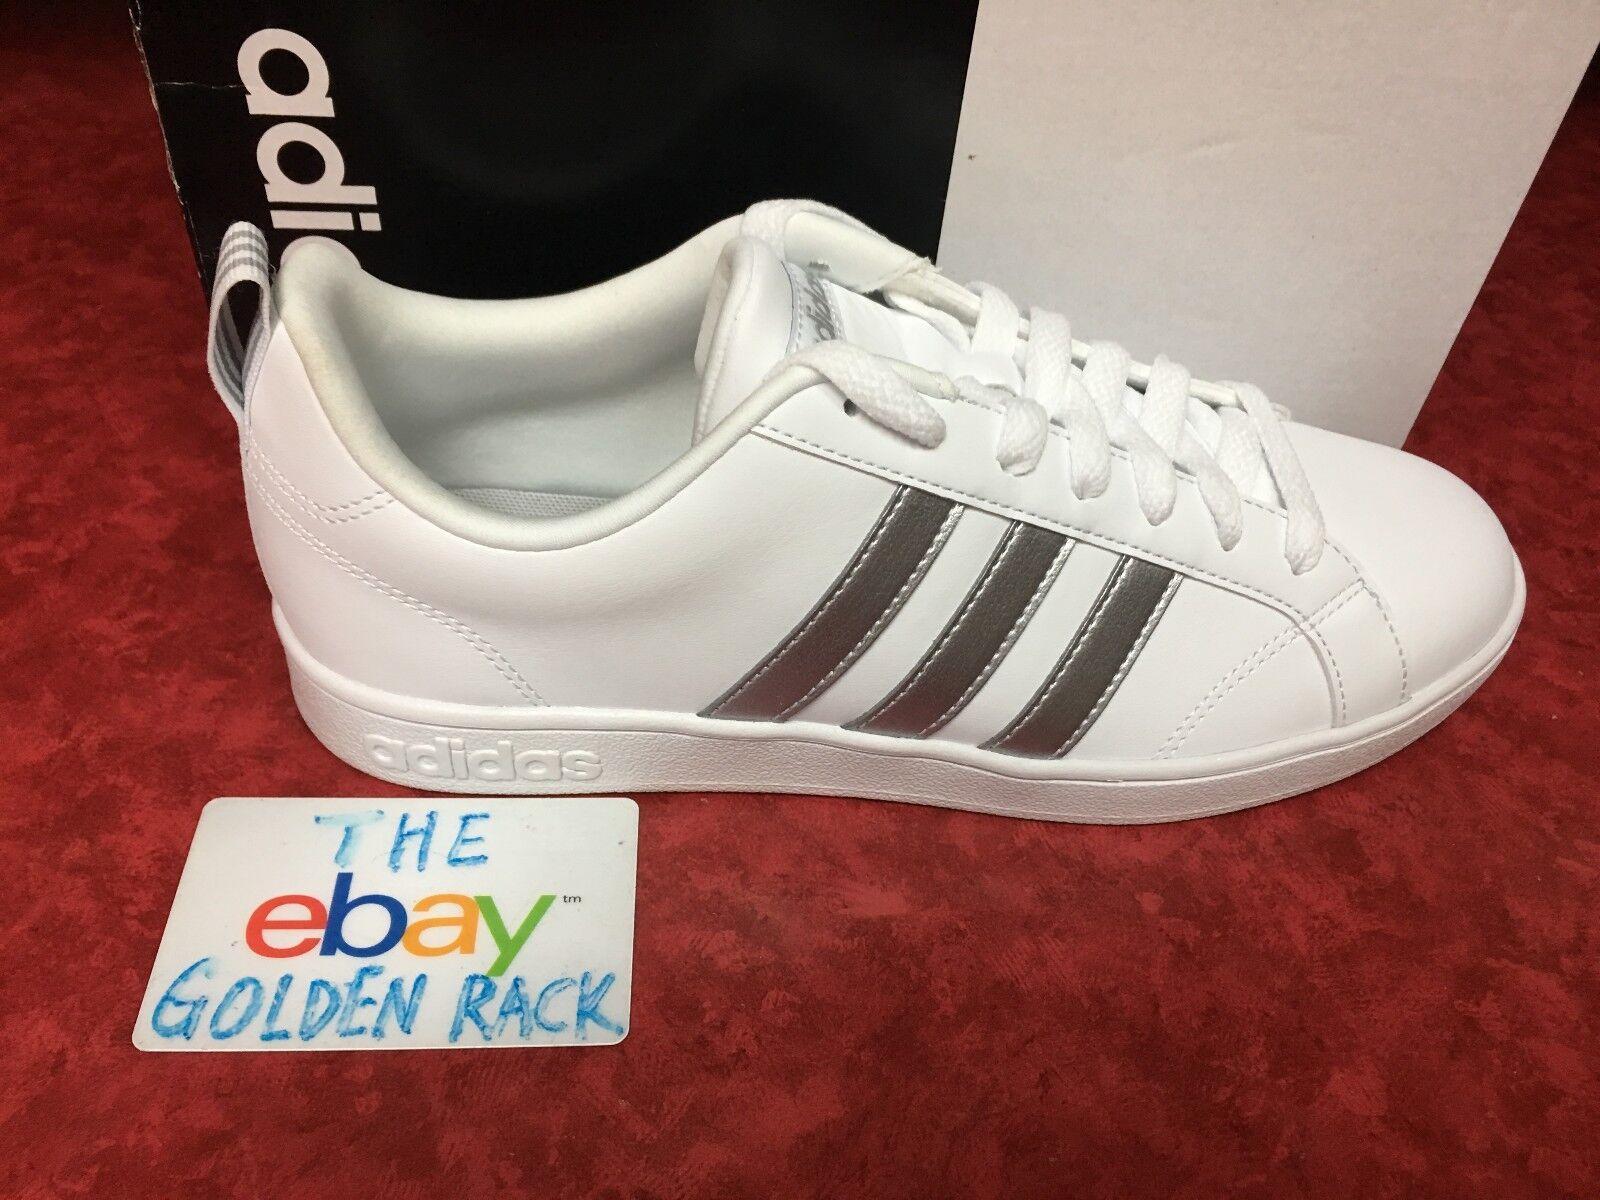 Adidas VS ADVANTAGE BB7248 White Silver Women's Shoes Price reduction